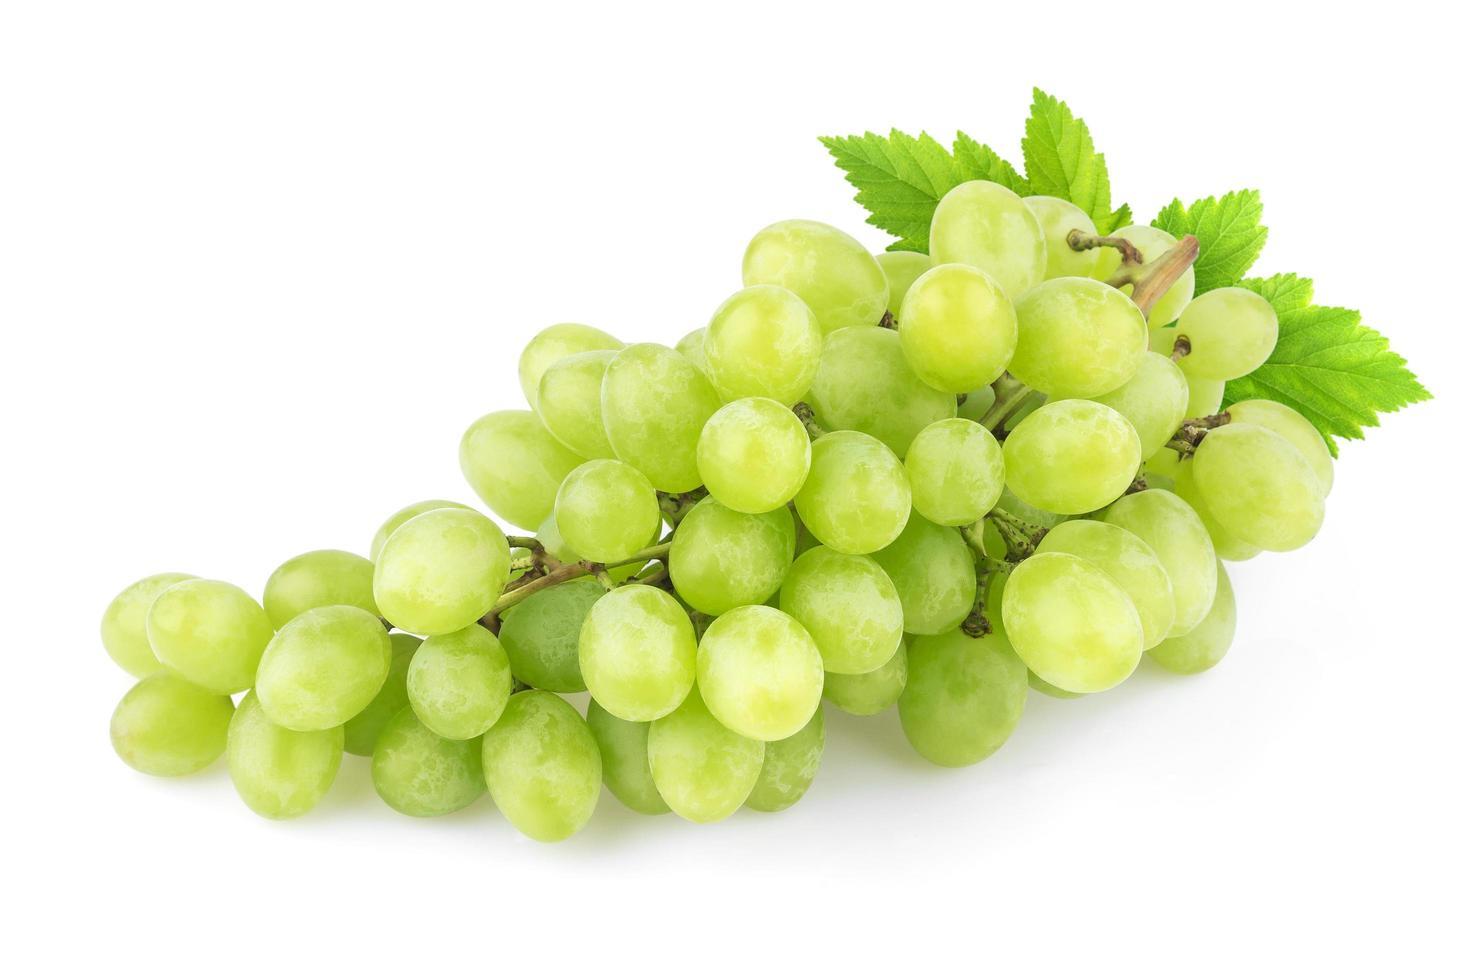 uvas aisladas sobre fondo blanco foto